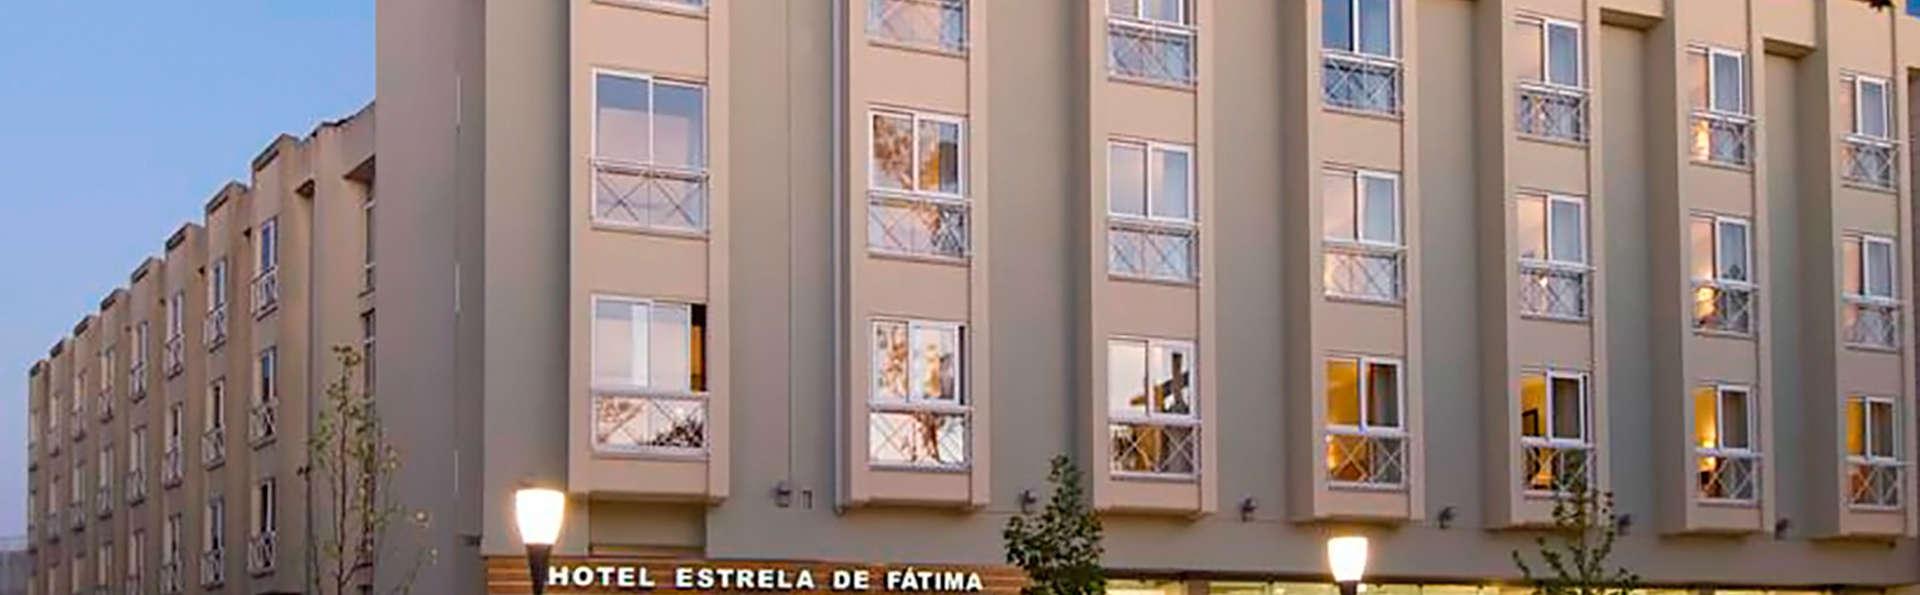 Hotel Estrela de Fátima - EDIT_front.jpg